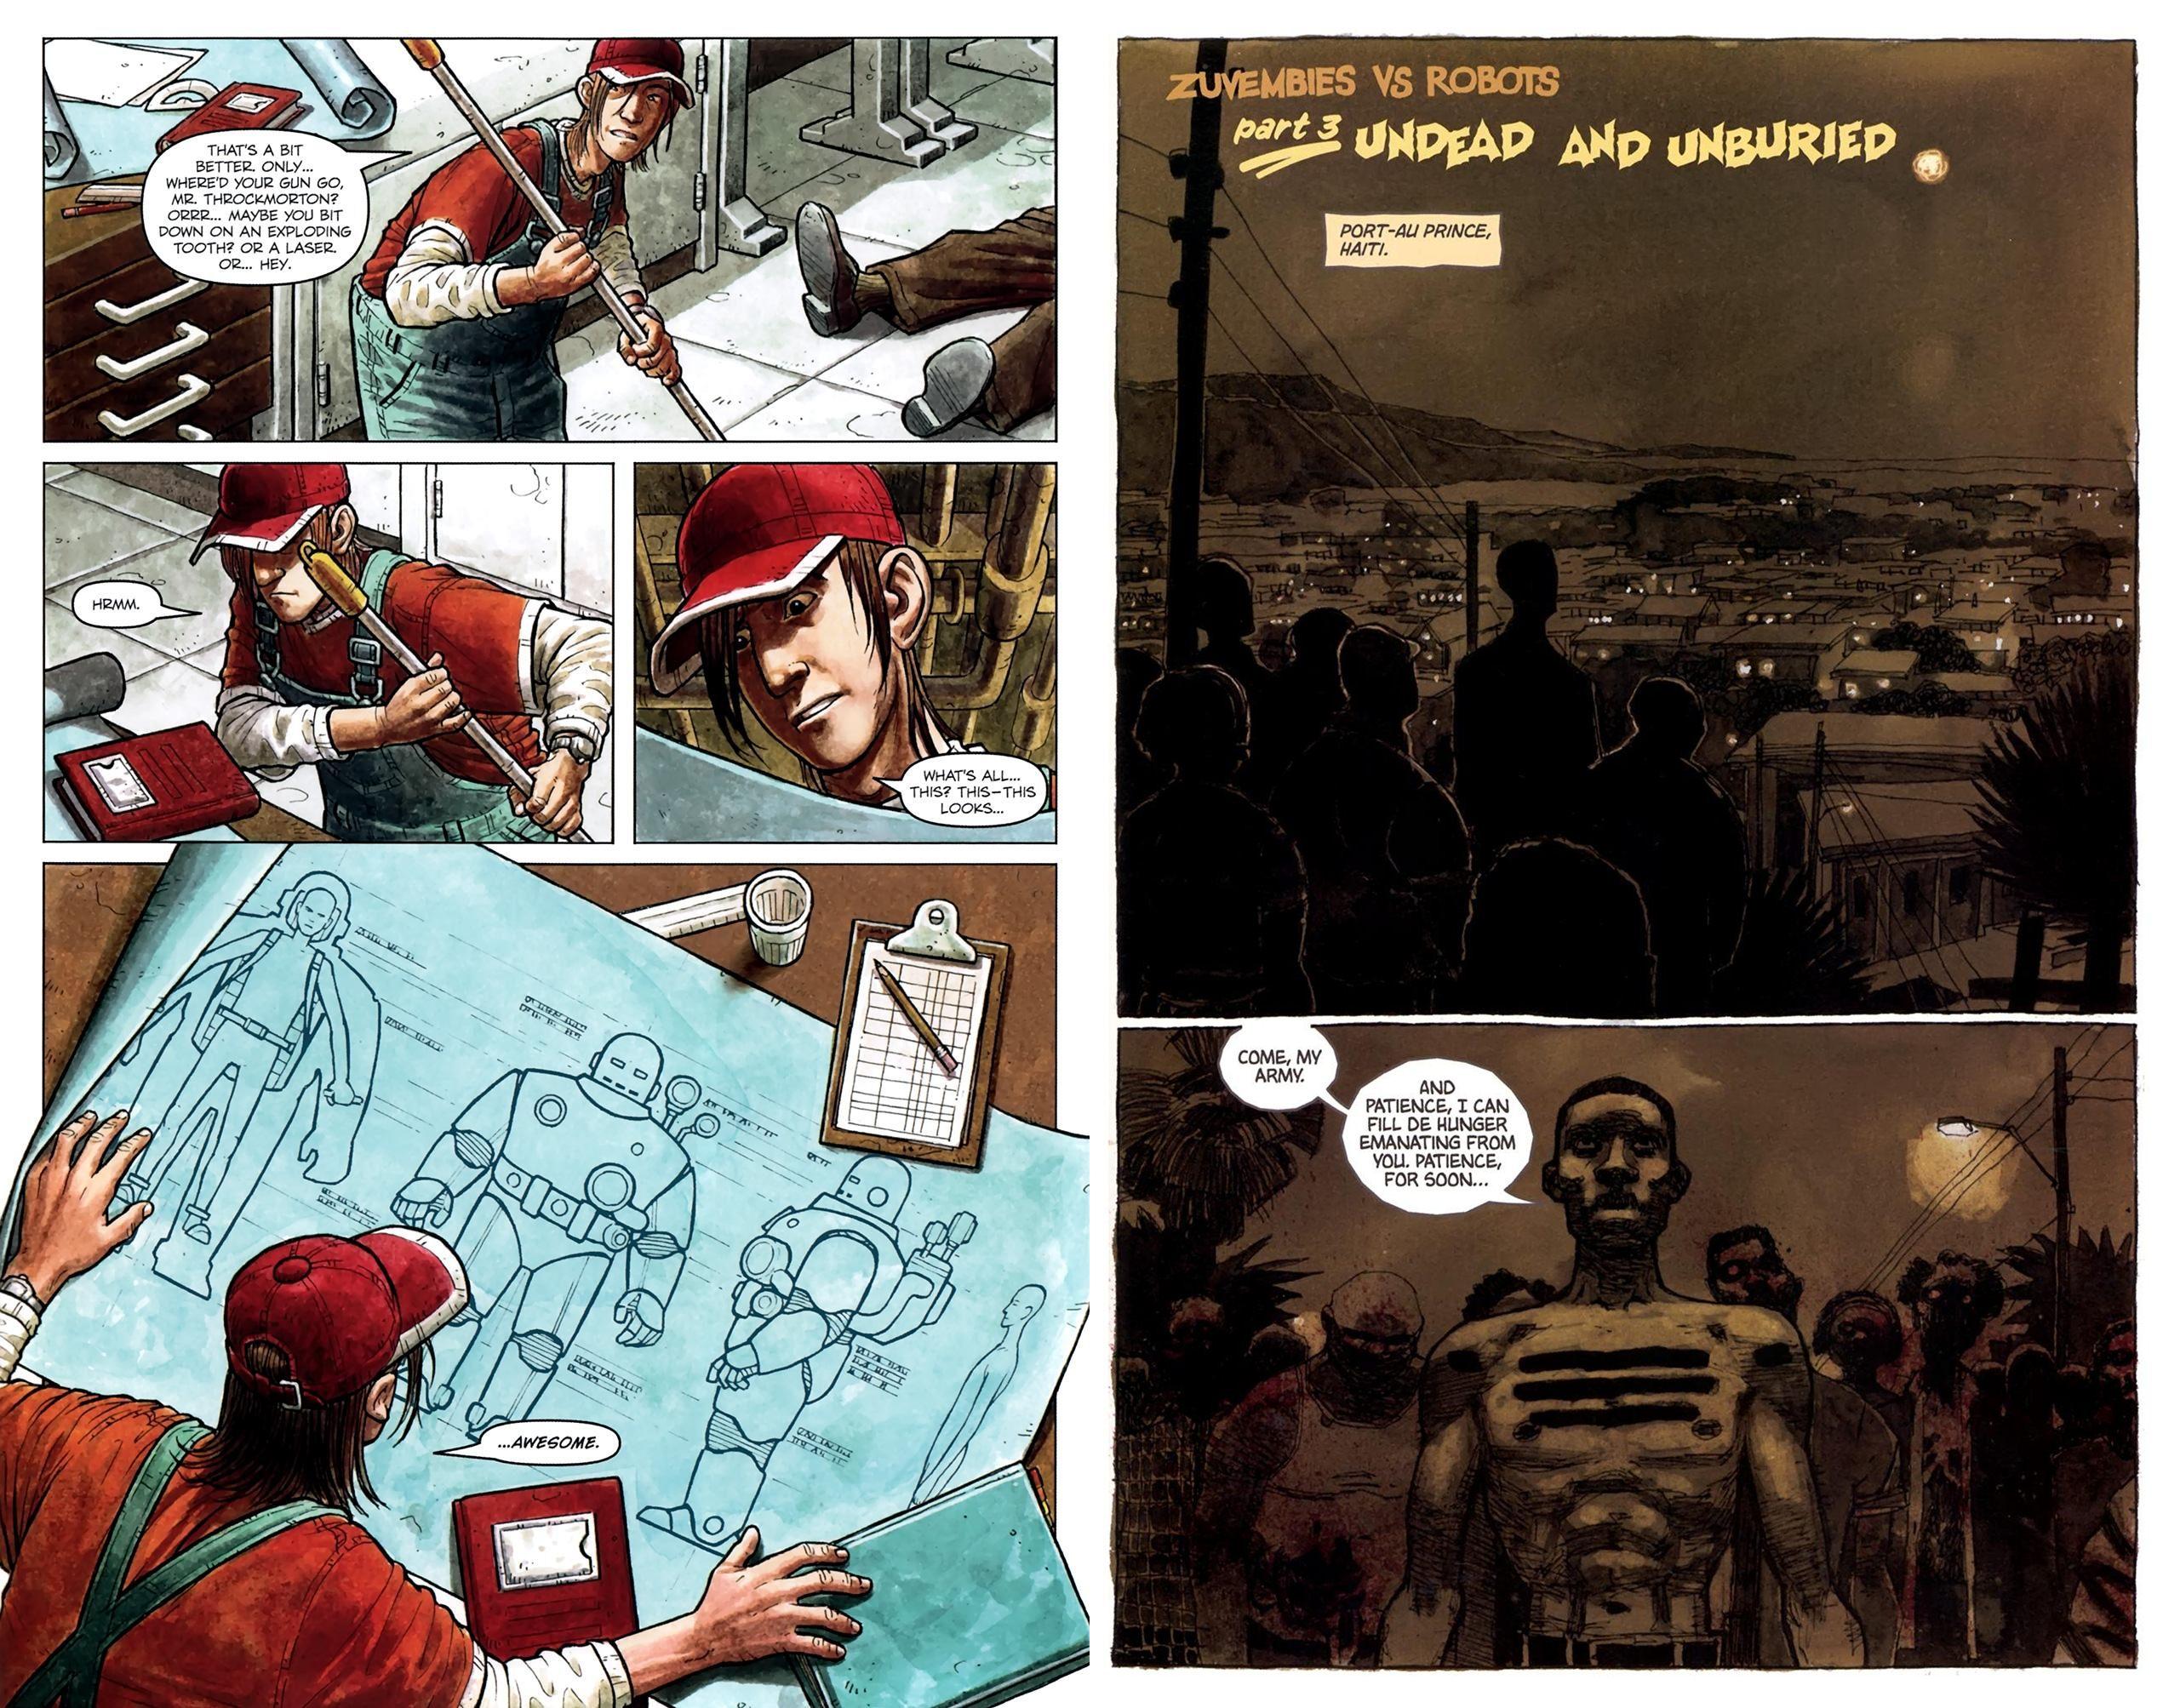 Zombies vs Robots Aventure review